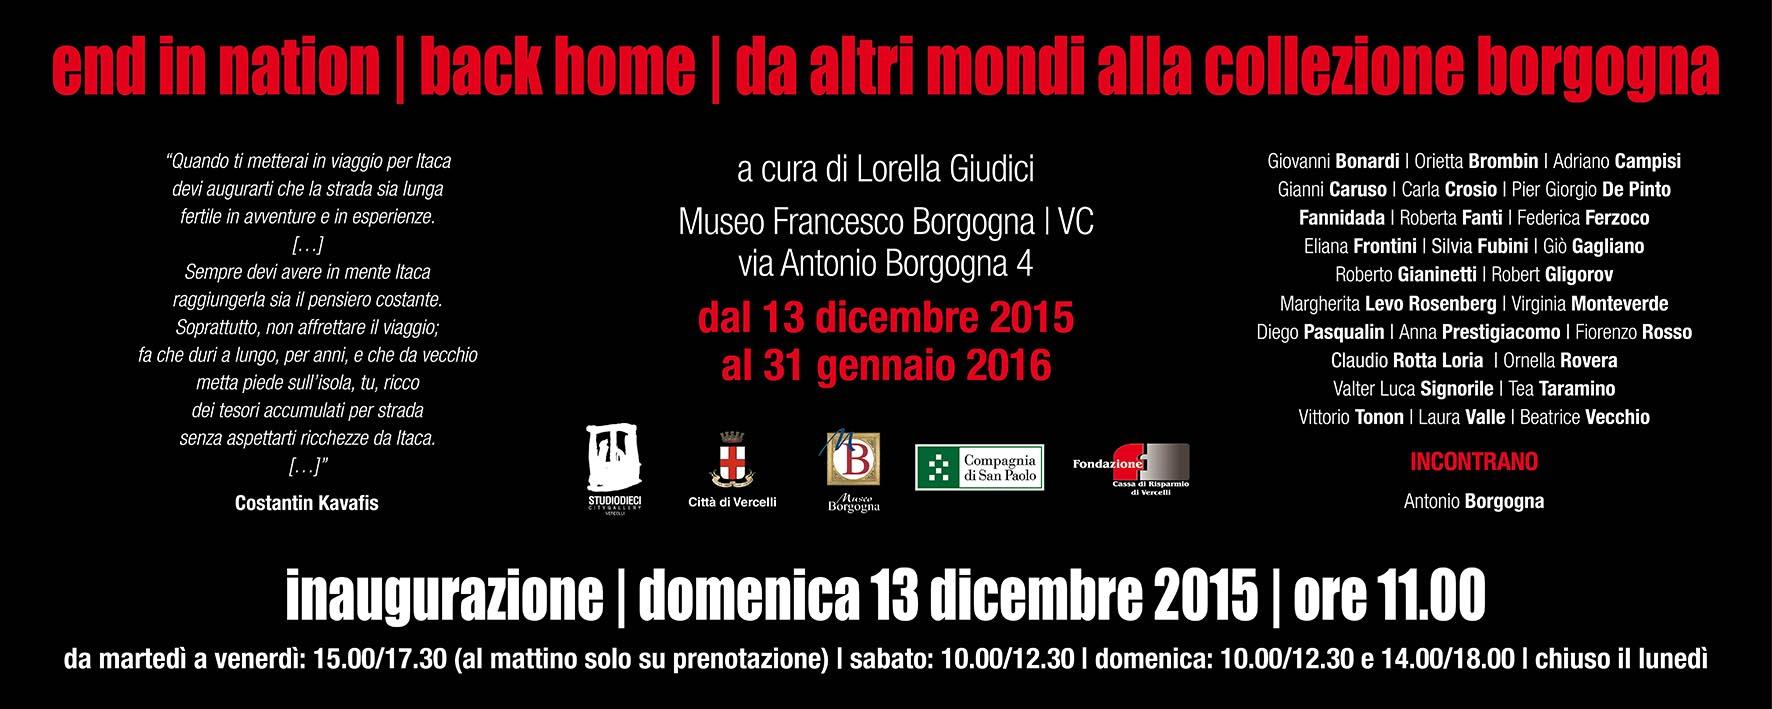 End in nation - Vercelli